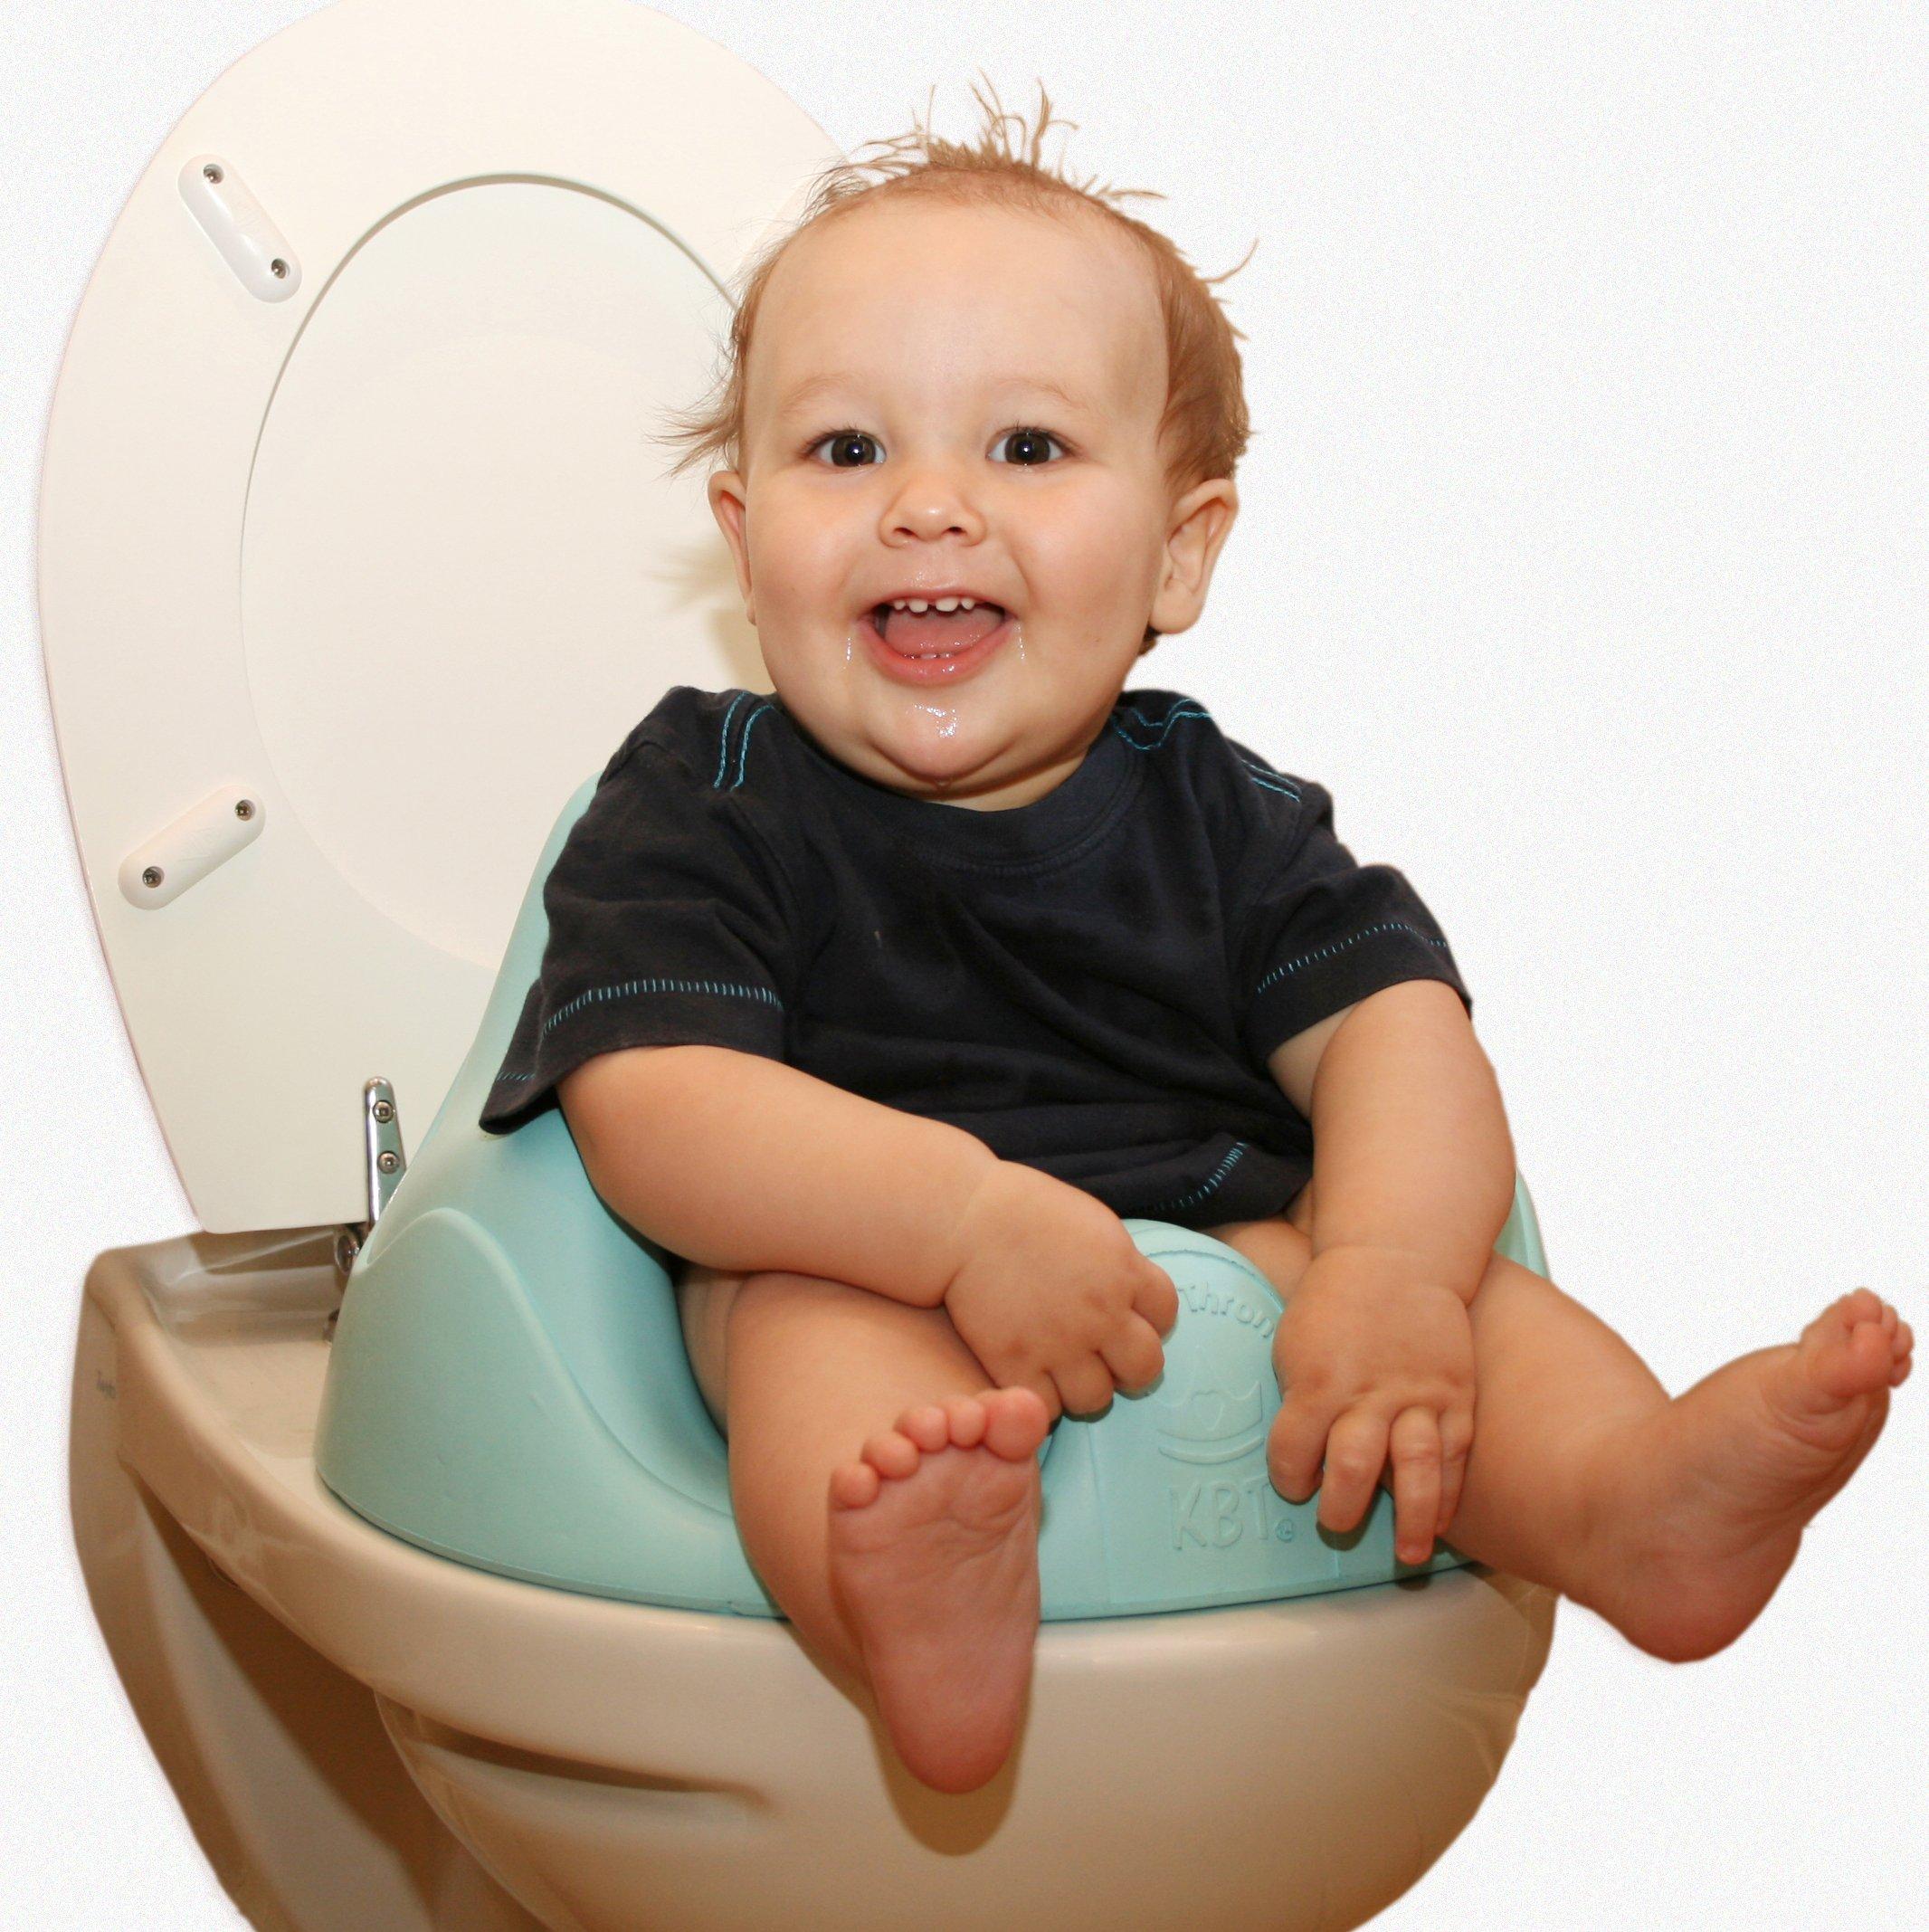 Baby Throne